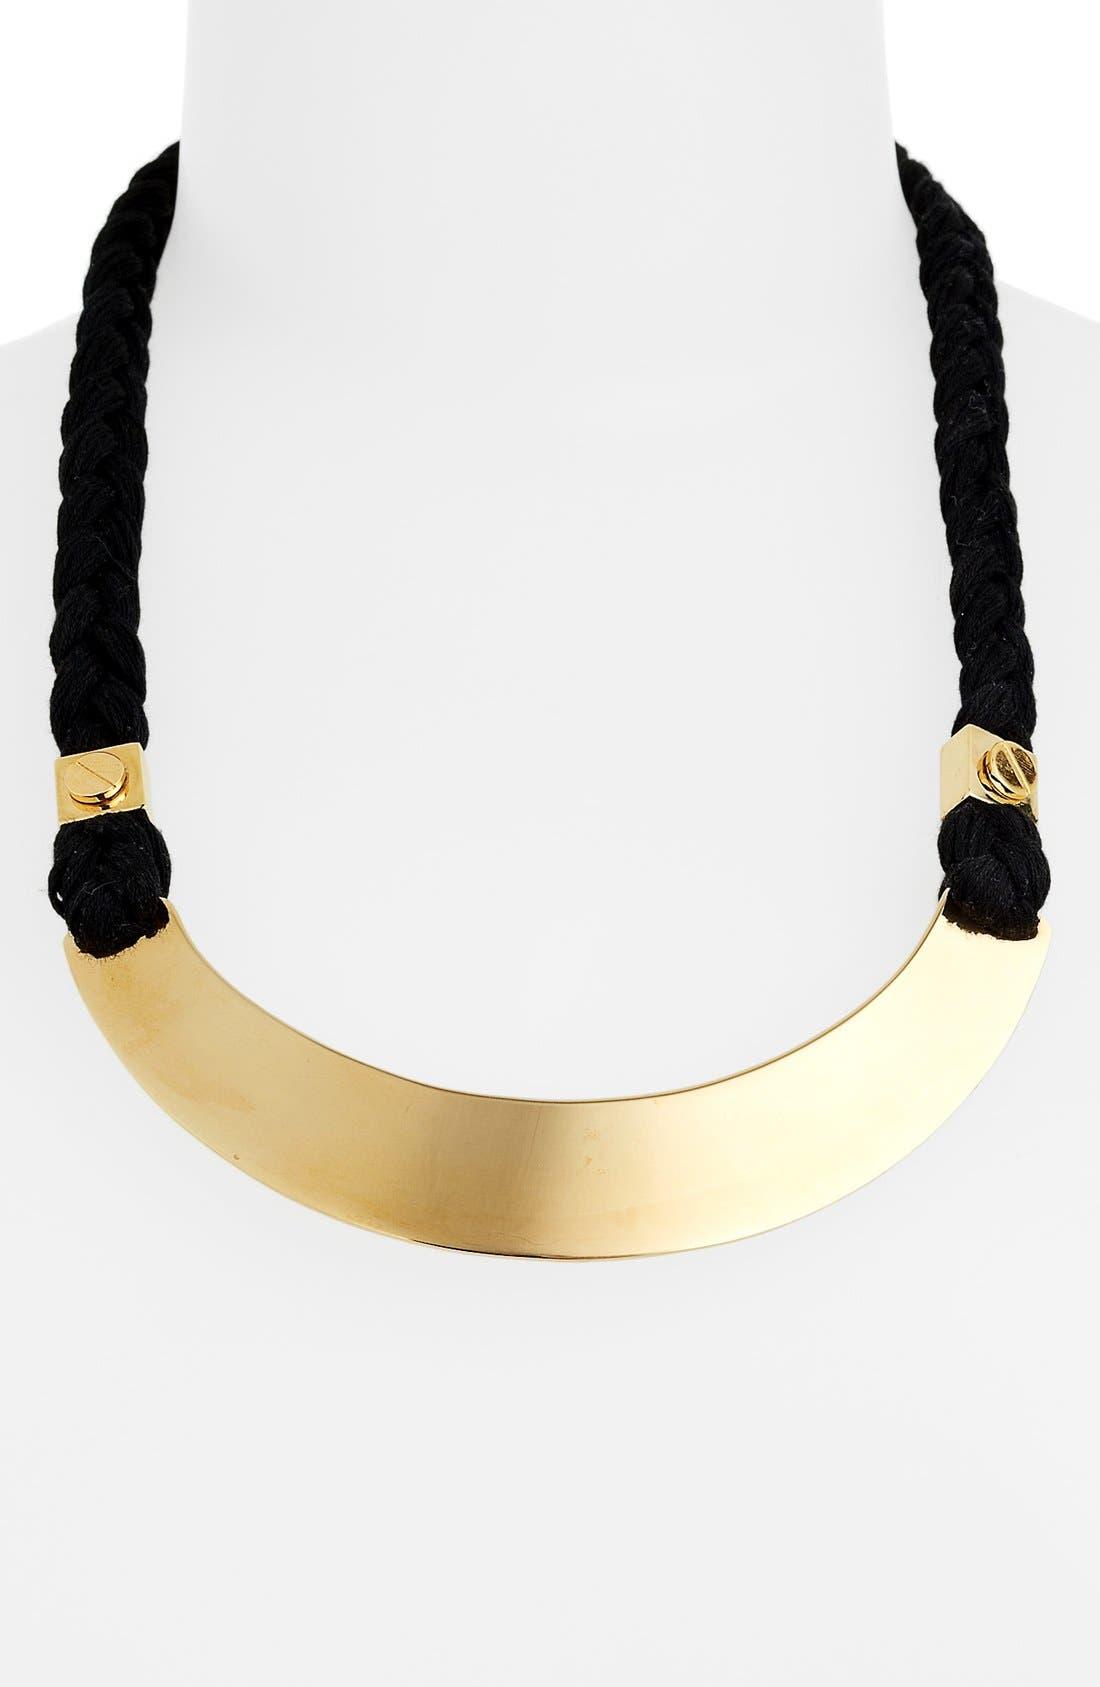 Main Image - Tory Burch Bib Necklace